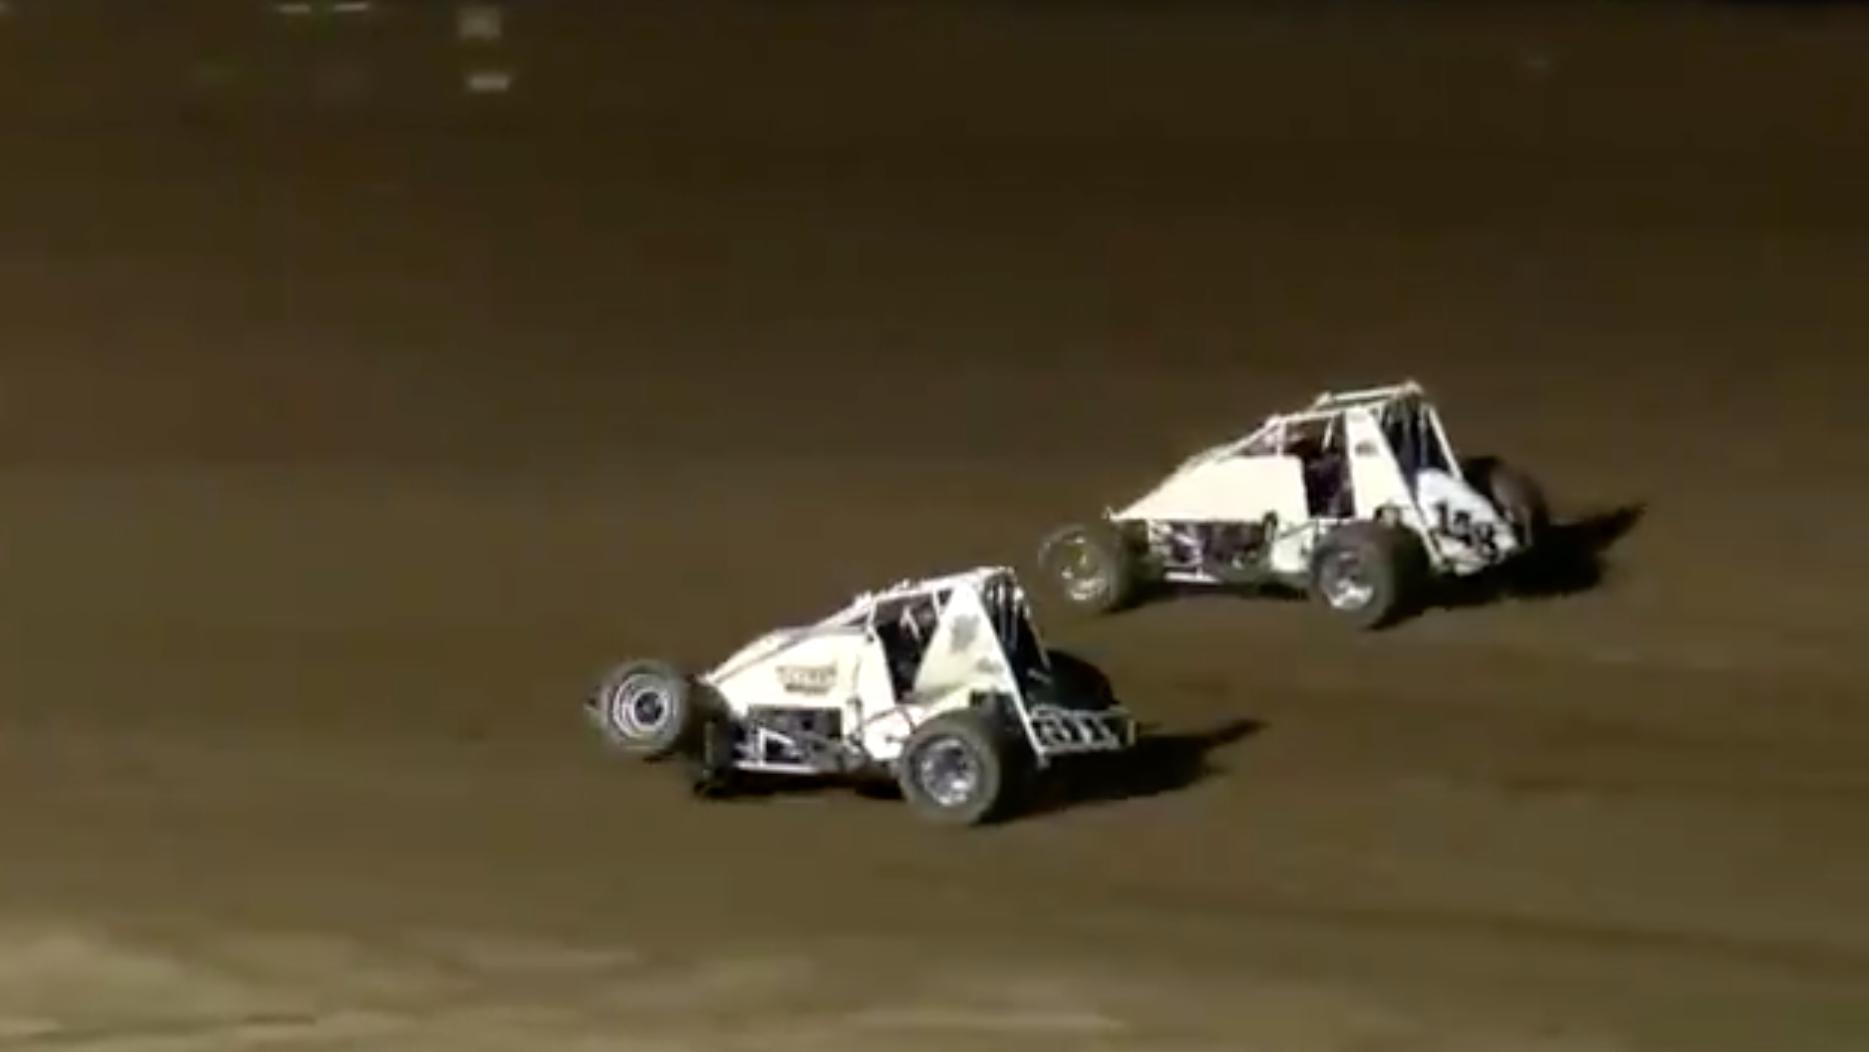 Sprint Car Driver Mangles Front Suspension, Still Wins Race